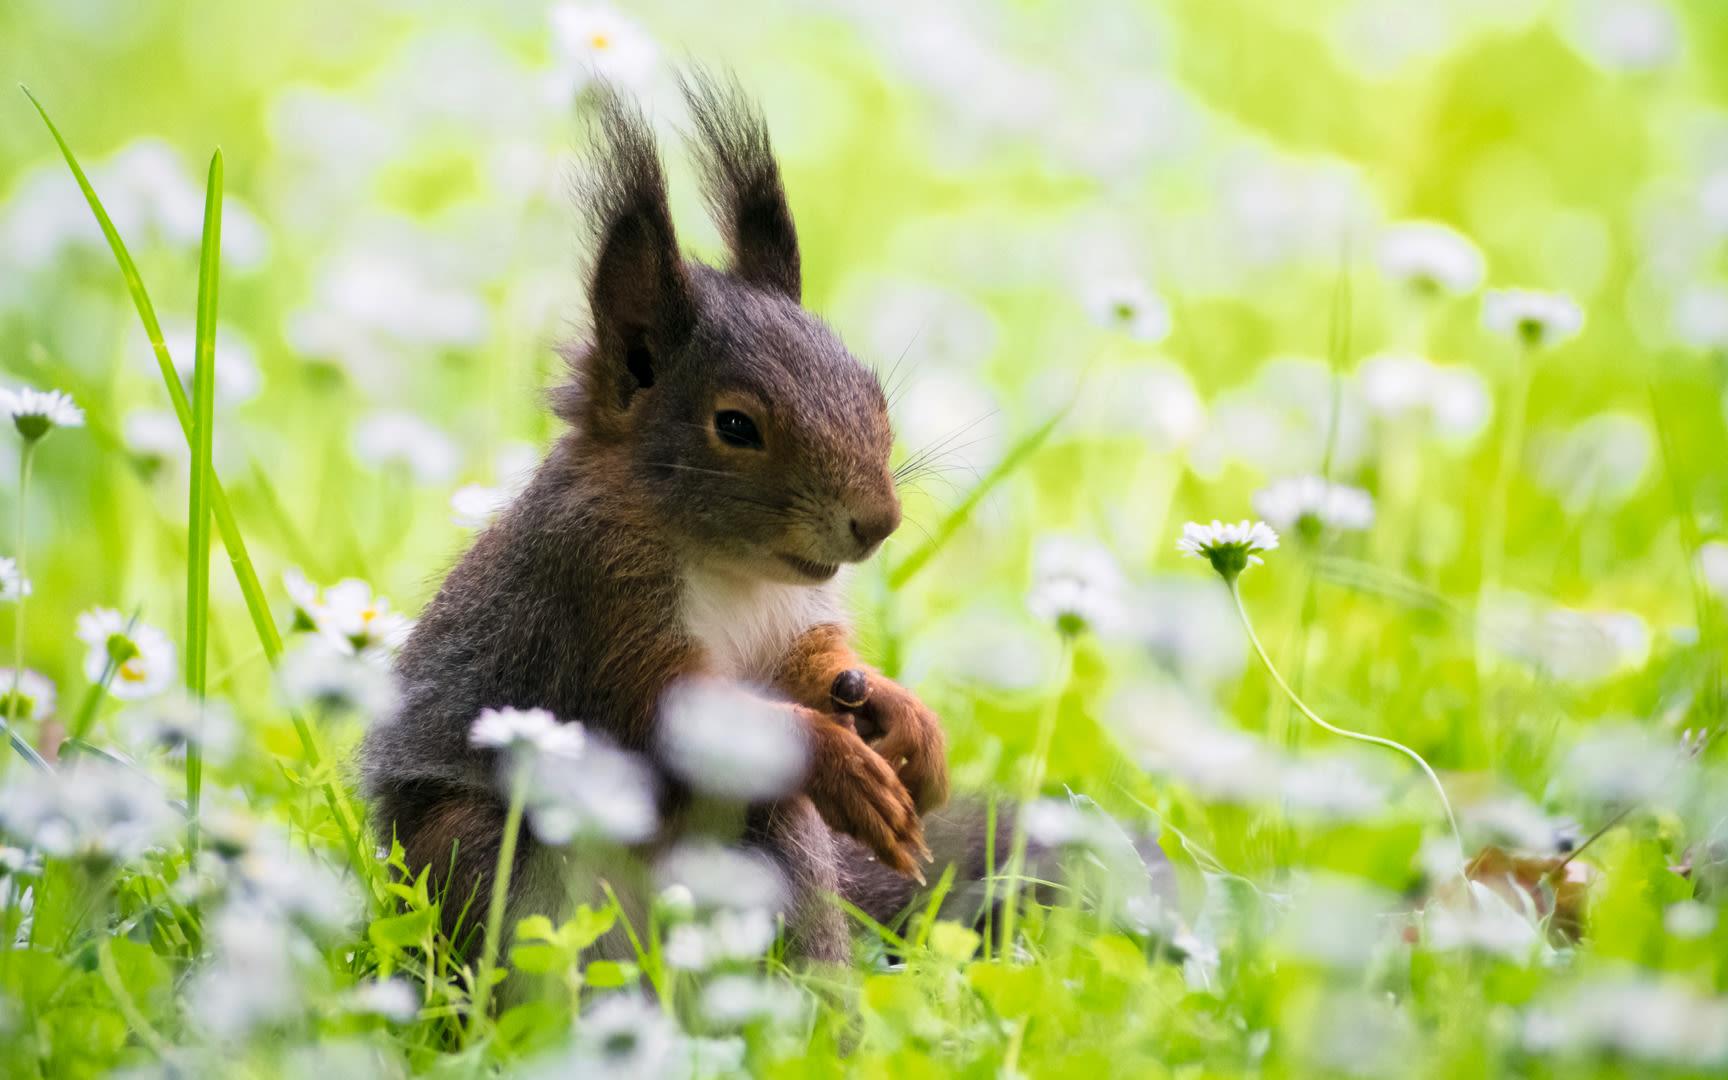 Squirrel (Sciurus vulgaris), Ozon, Red Squirrel, Sciurus vulgaris, Germany by Gabriel Ozon